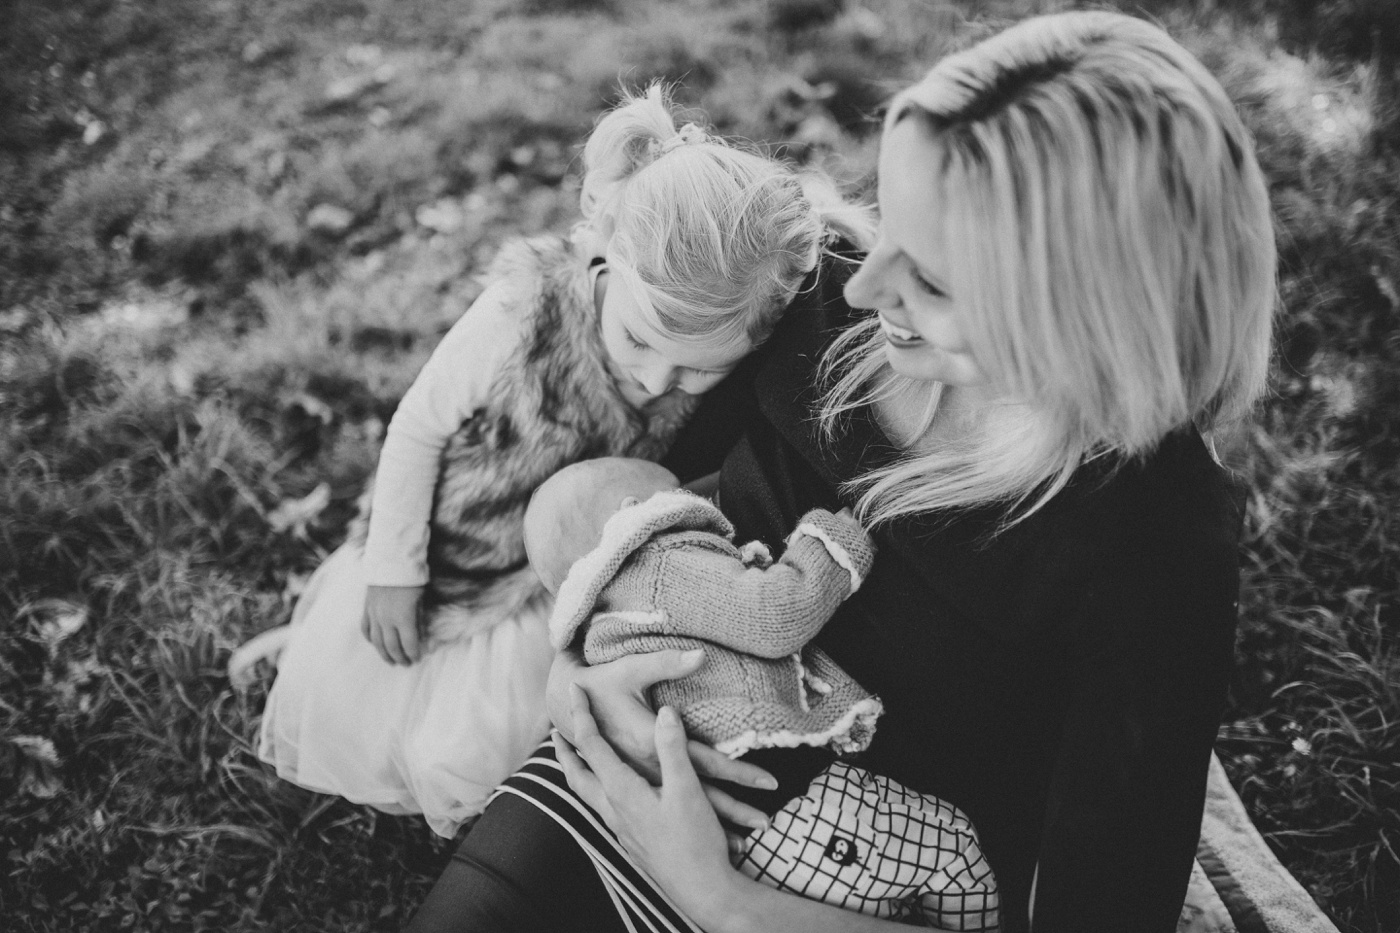 Blake-Lily-Rolig-Lekfull-Familjesession-Familjefotograf-Stockholm-Orebro_13